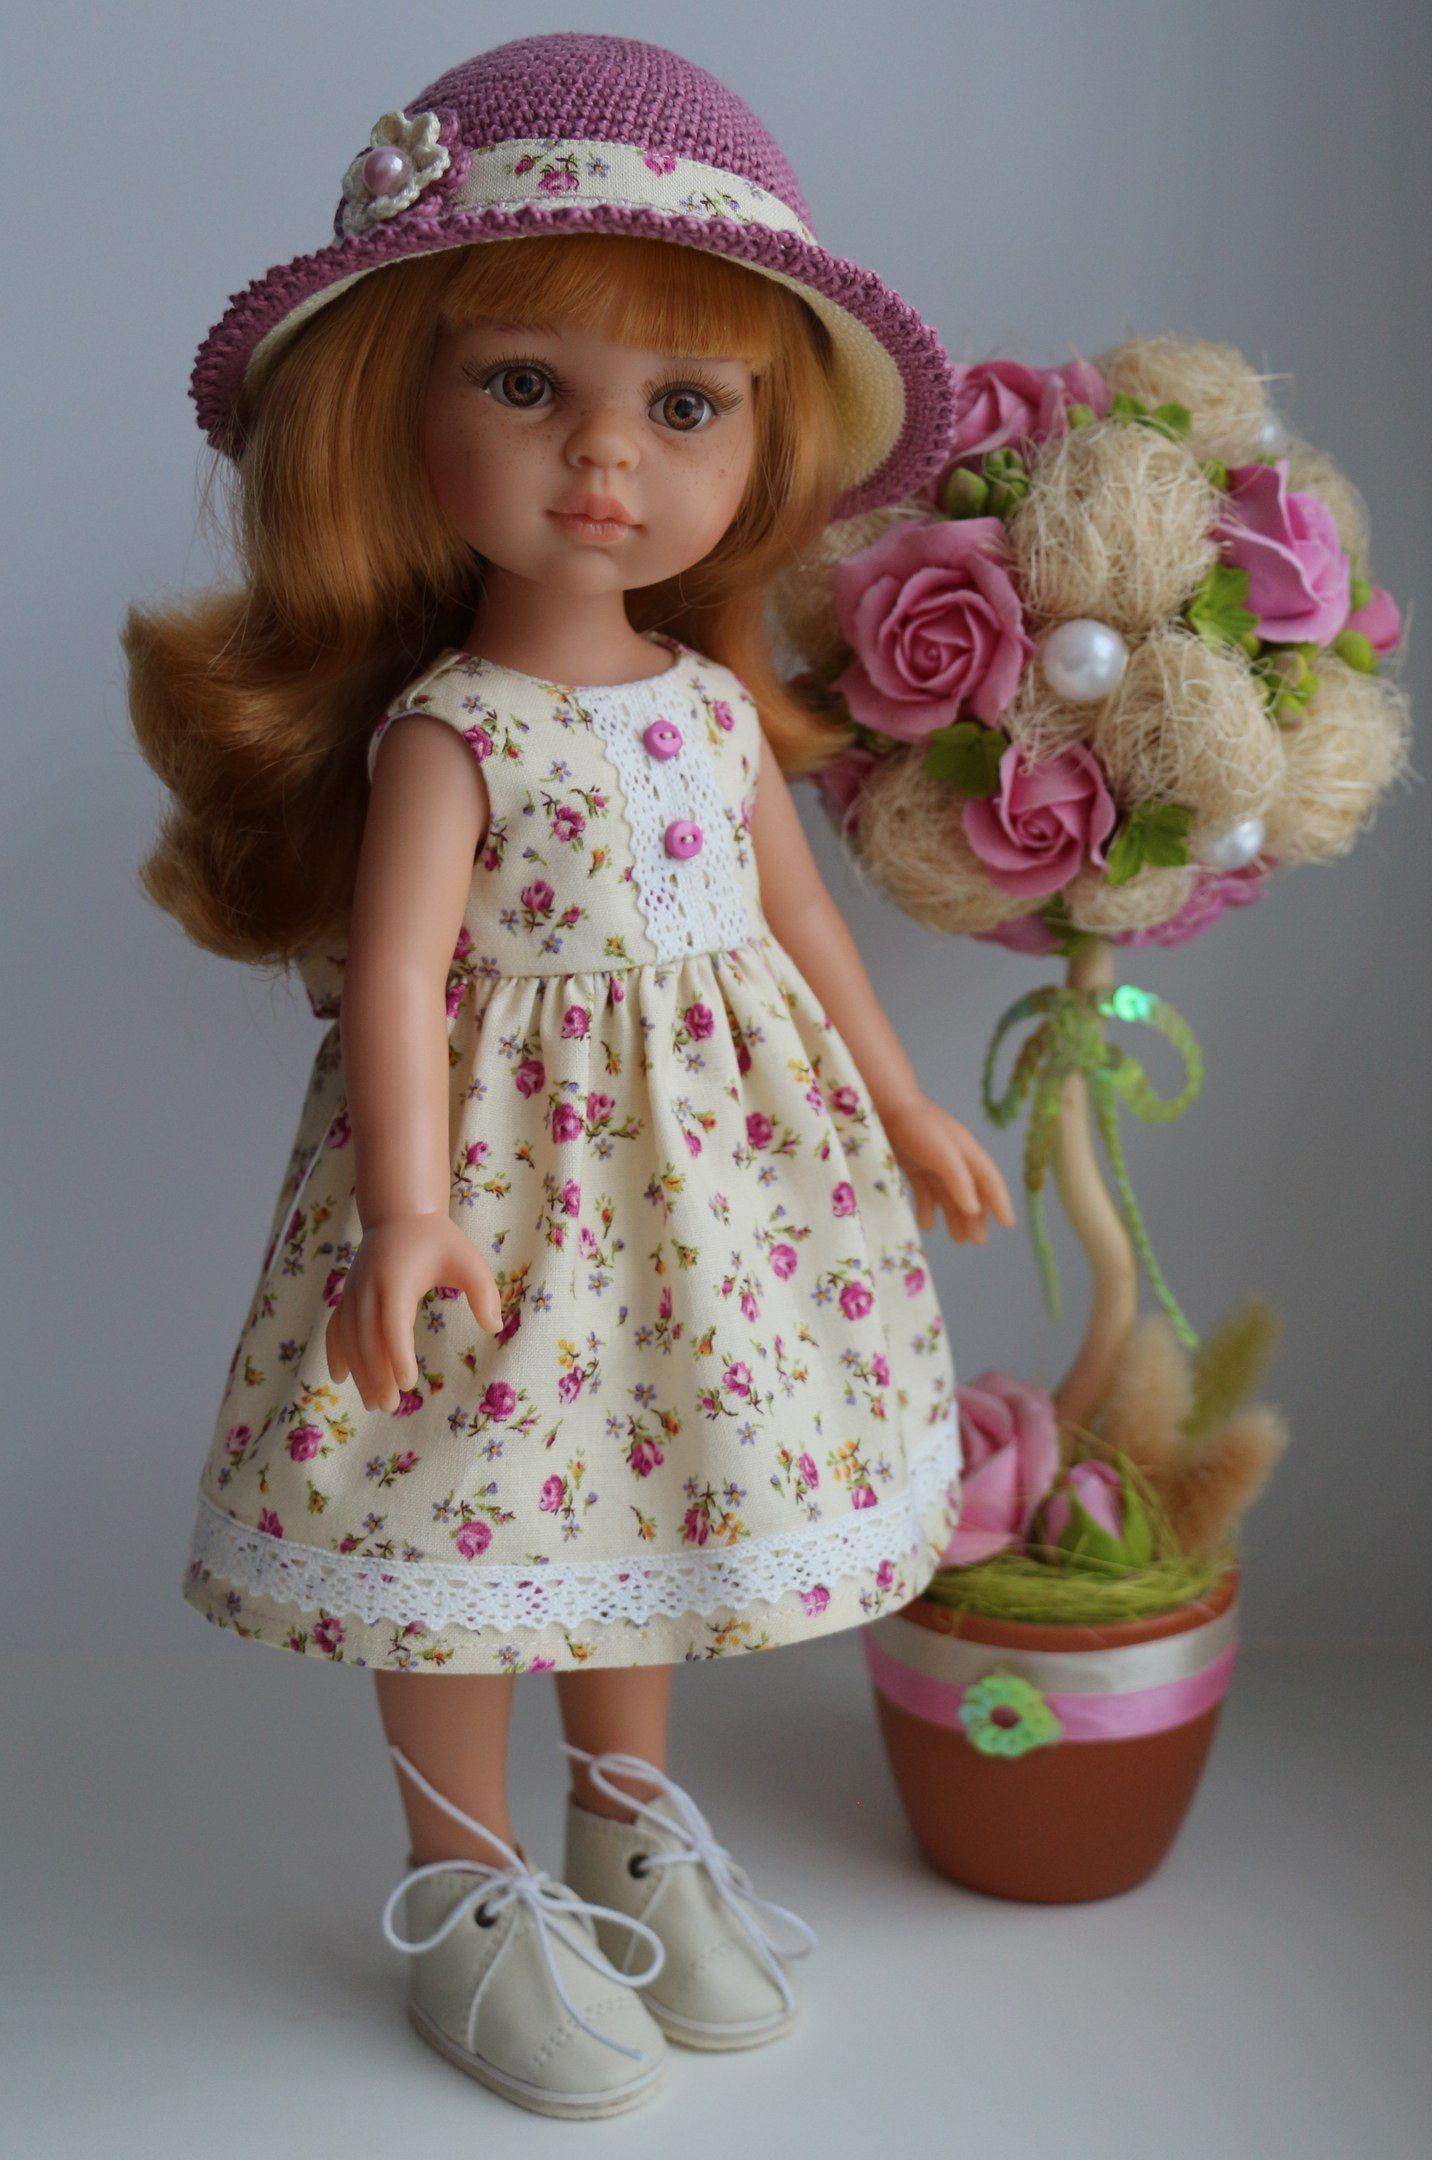 Испанские куклы Paola Reina | Кукольная мода | Pinterest | Puppen ...